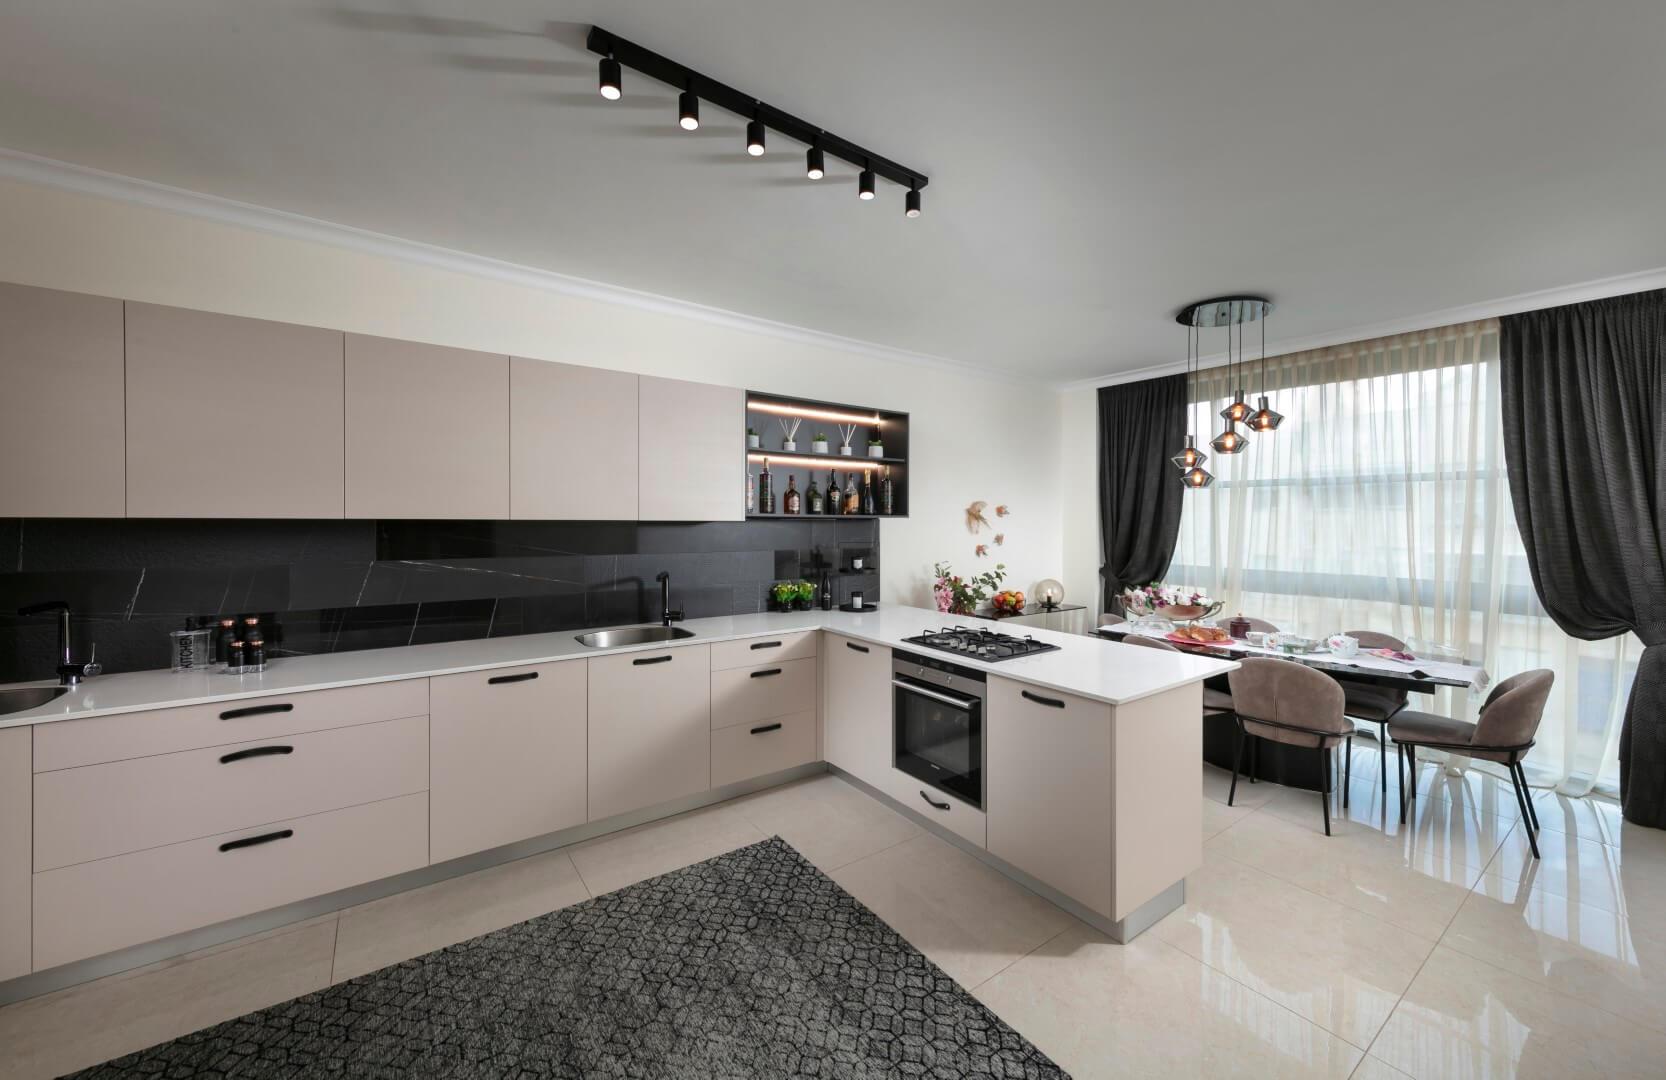 ריצוף גרניט פורצלן במטבח לבן